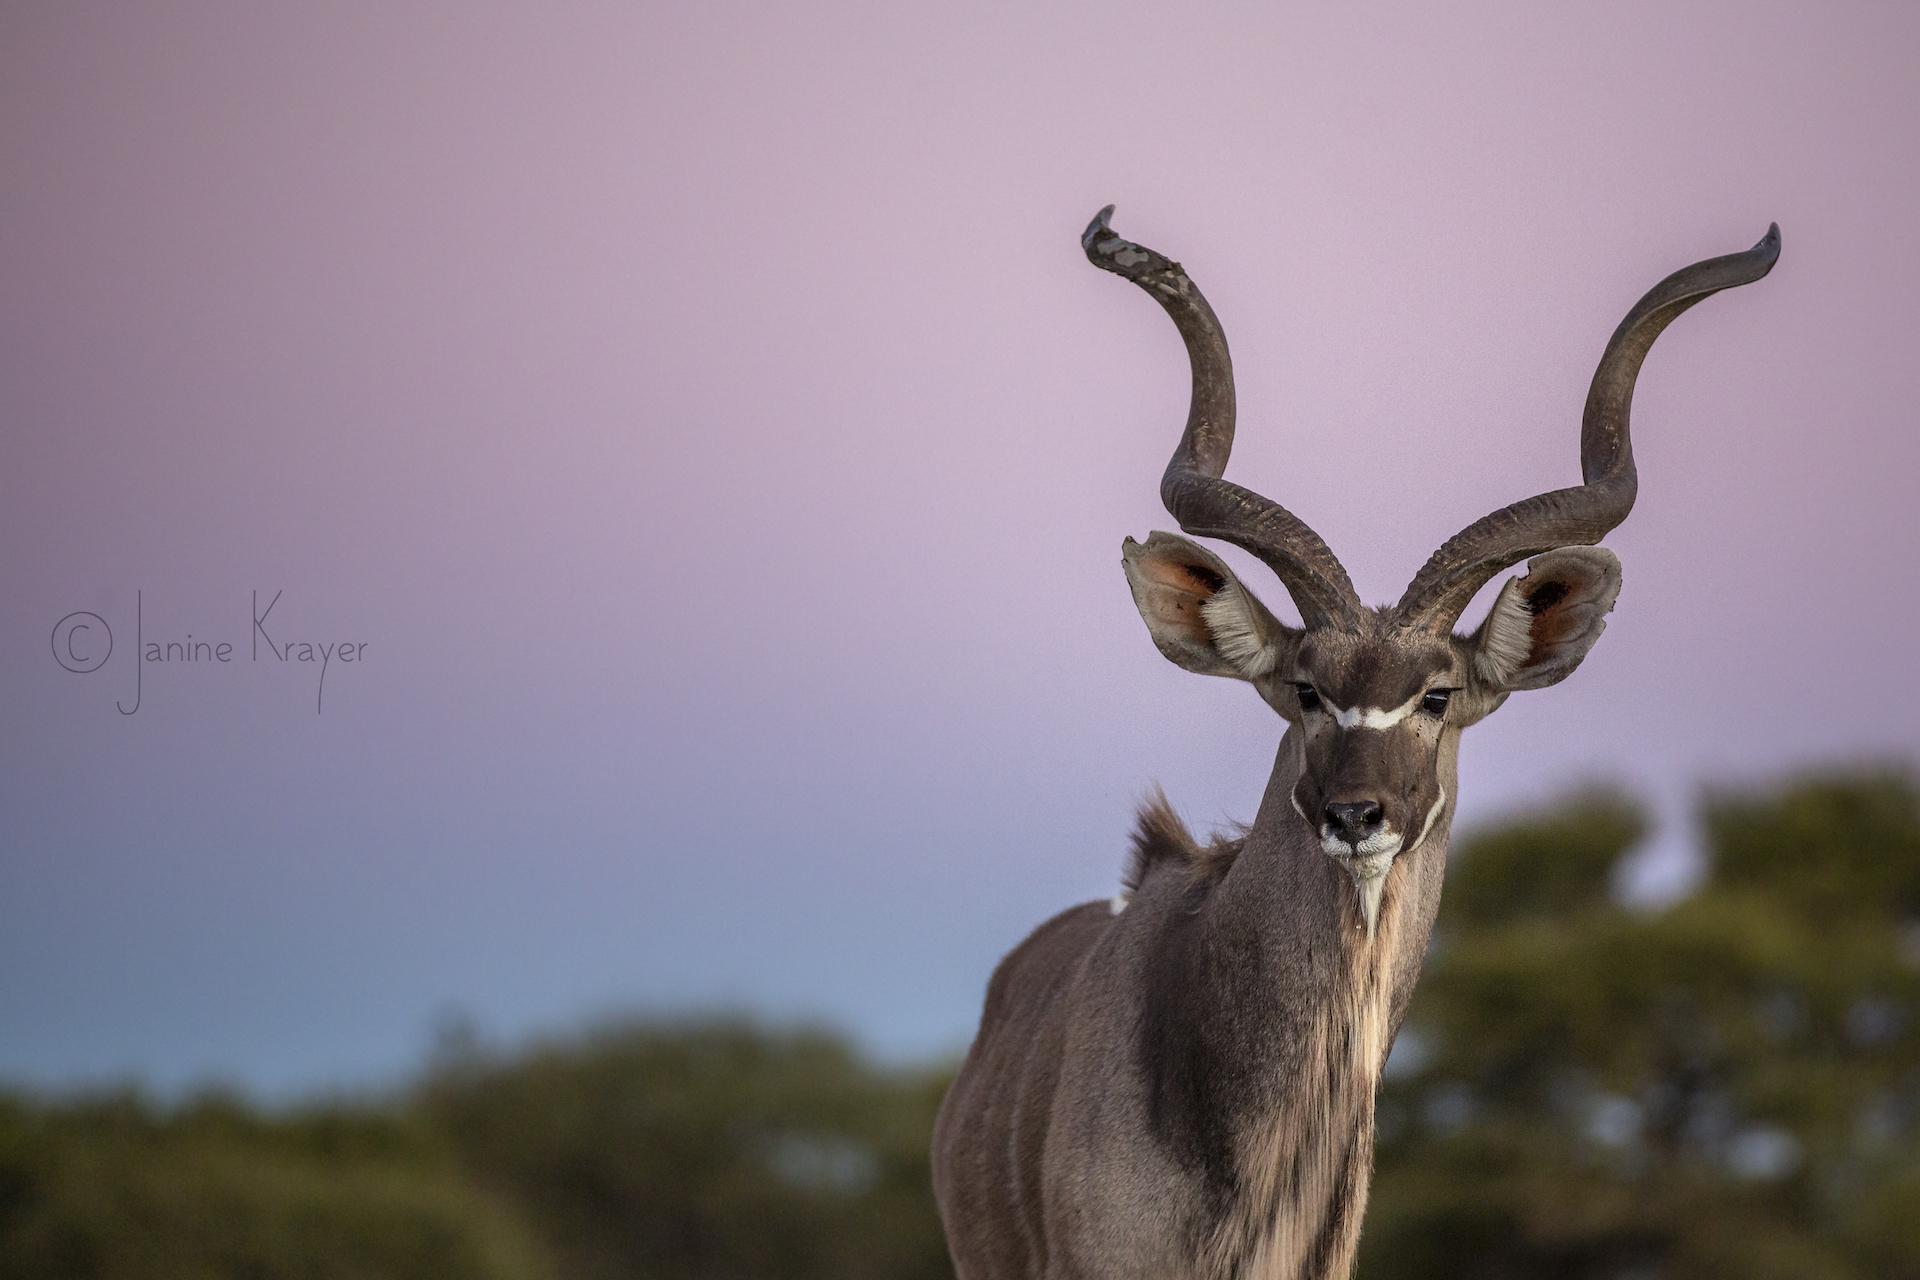 Janine Krayer Wildlife Photography-1-19